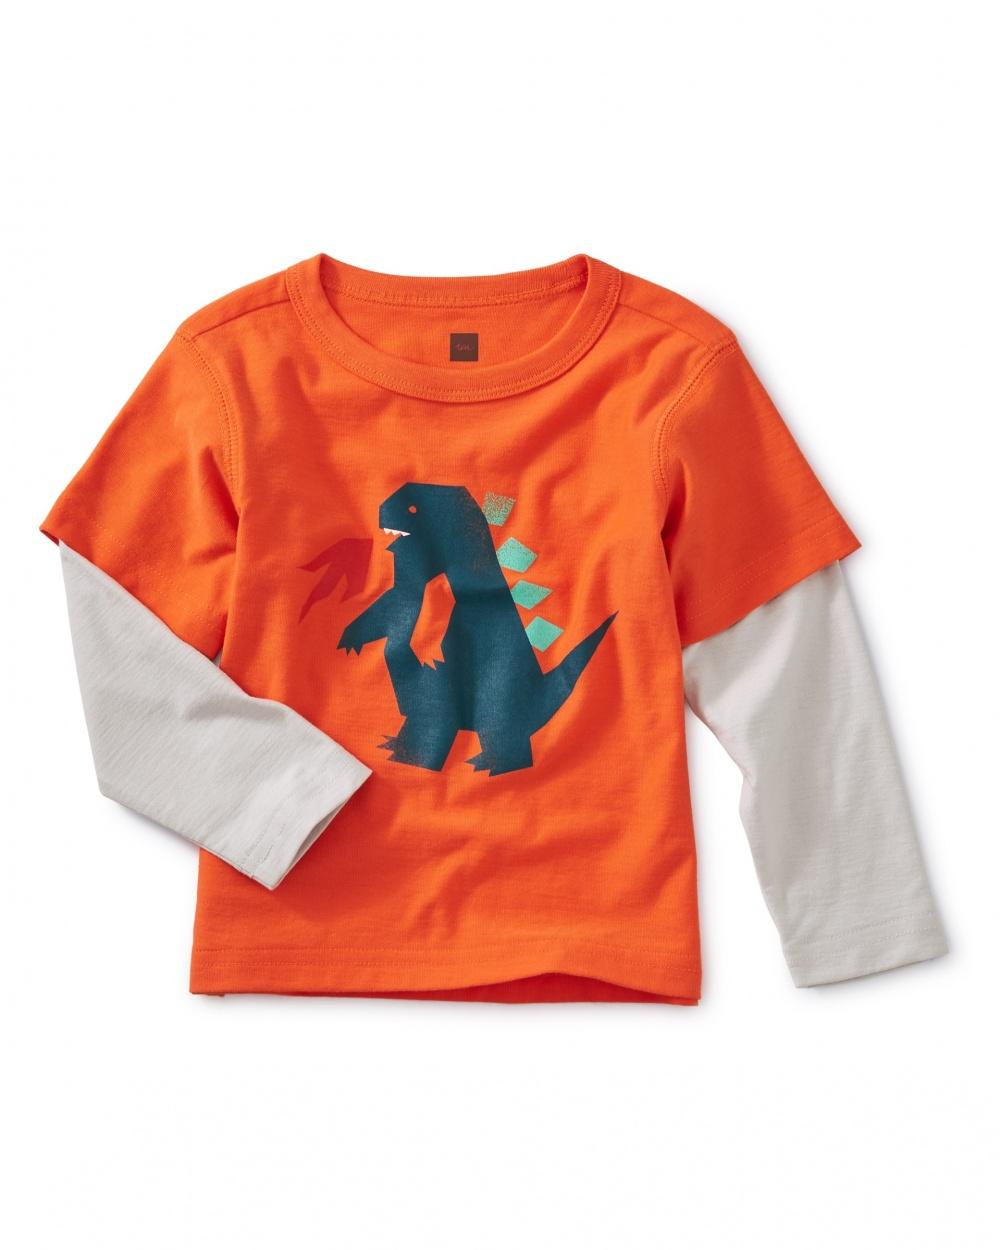 Dinosaur Layered Sleeve Tee